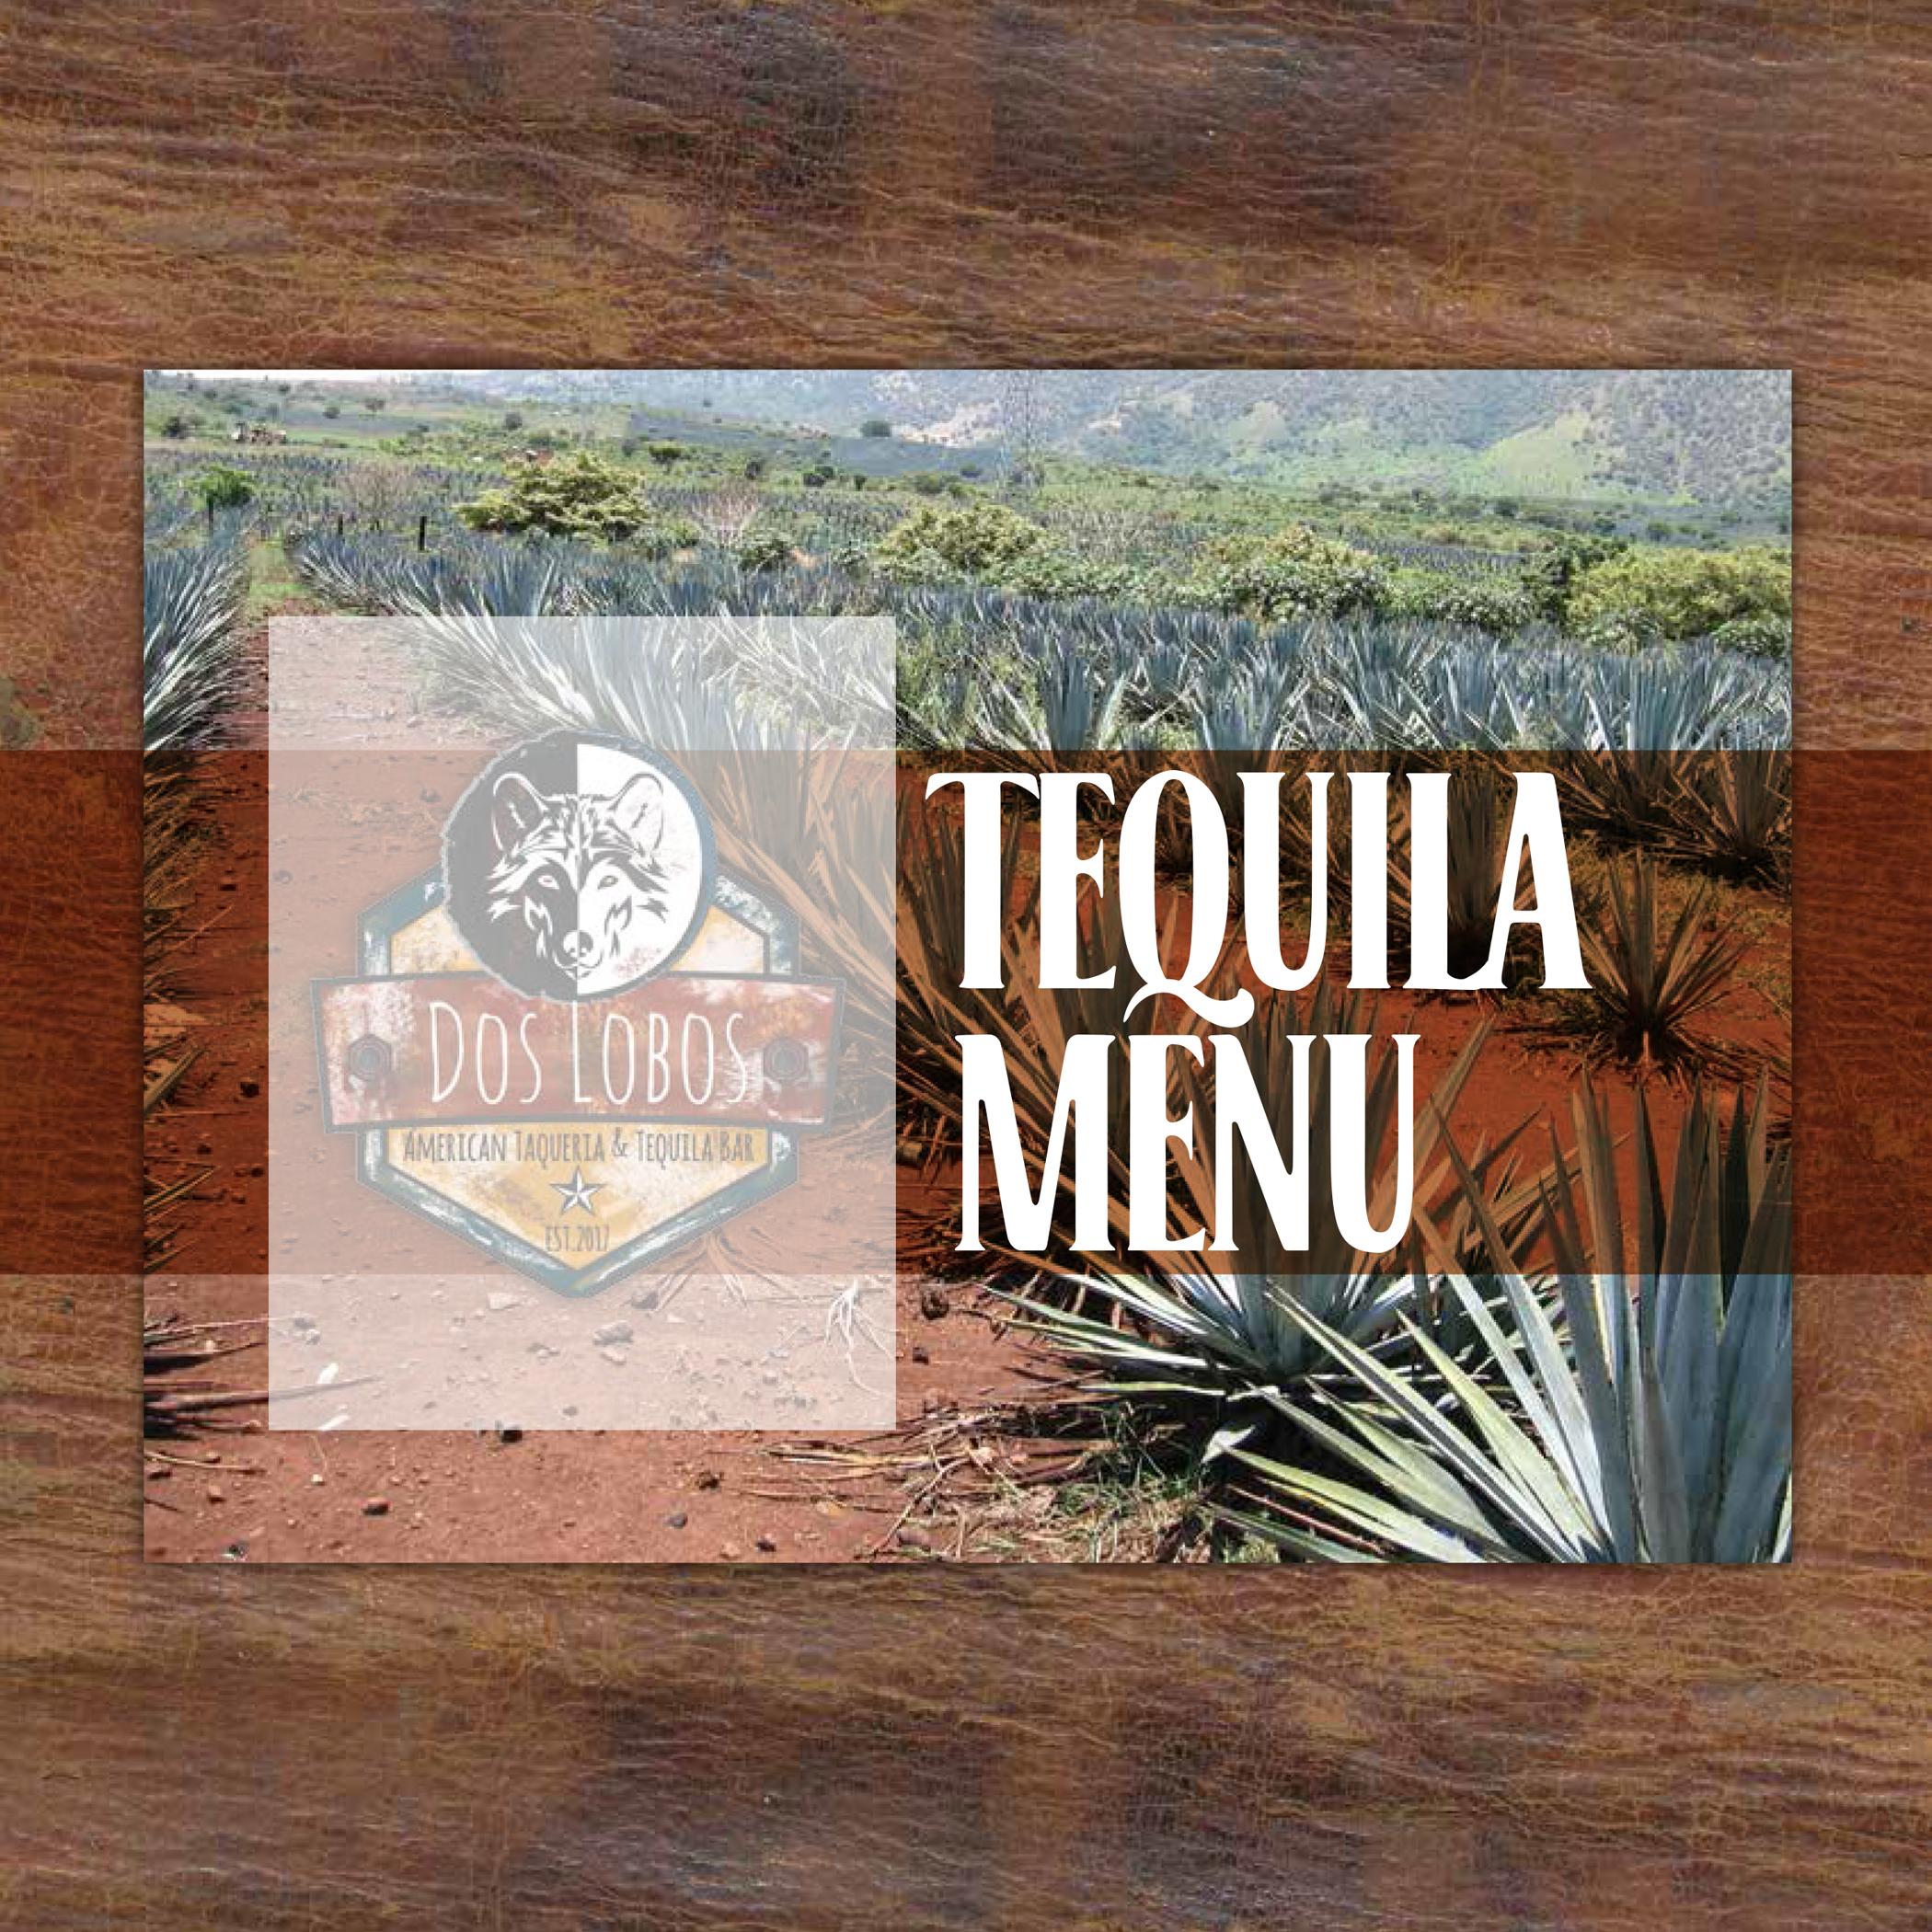 Tequila Tasting Menu